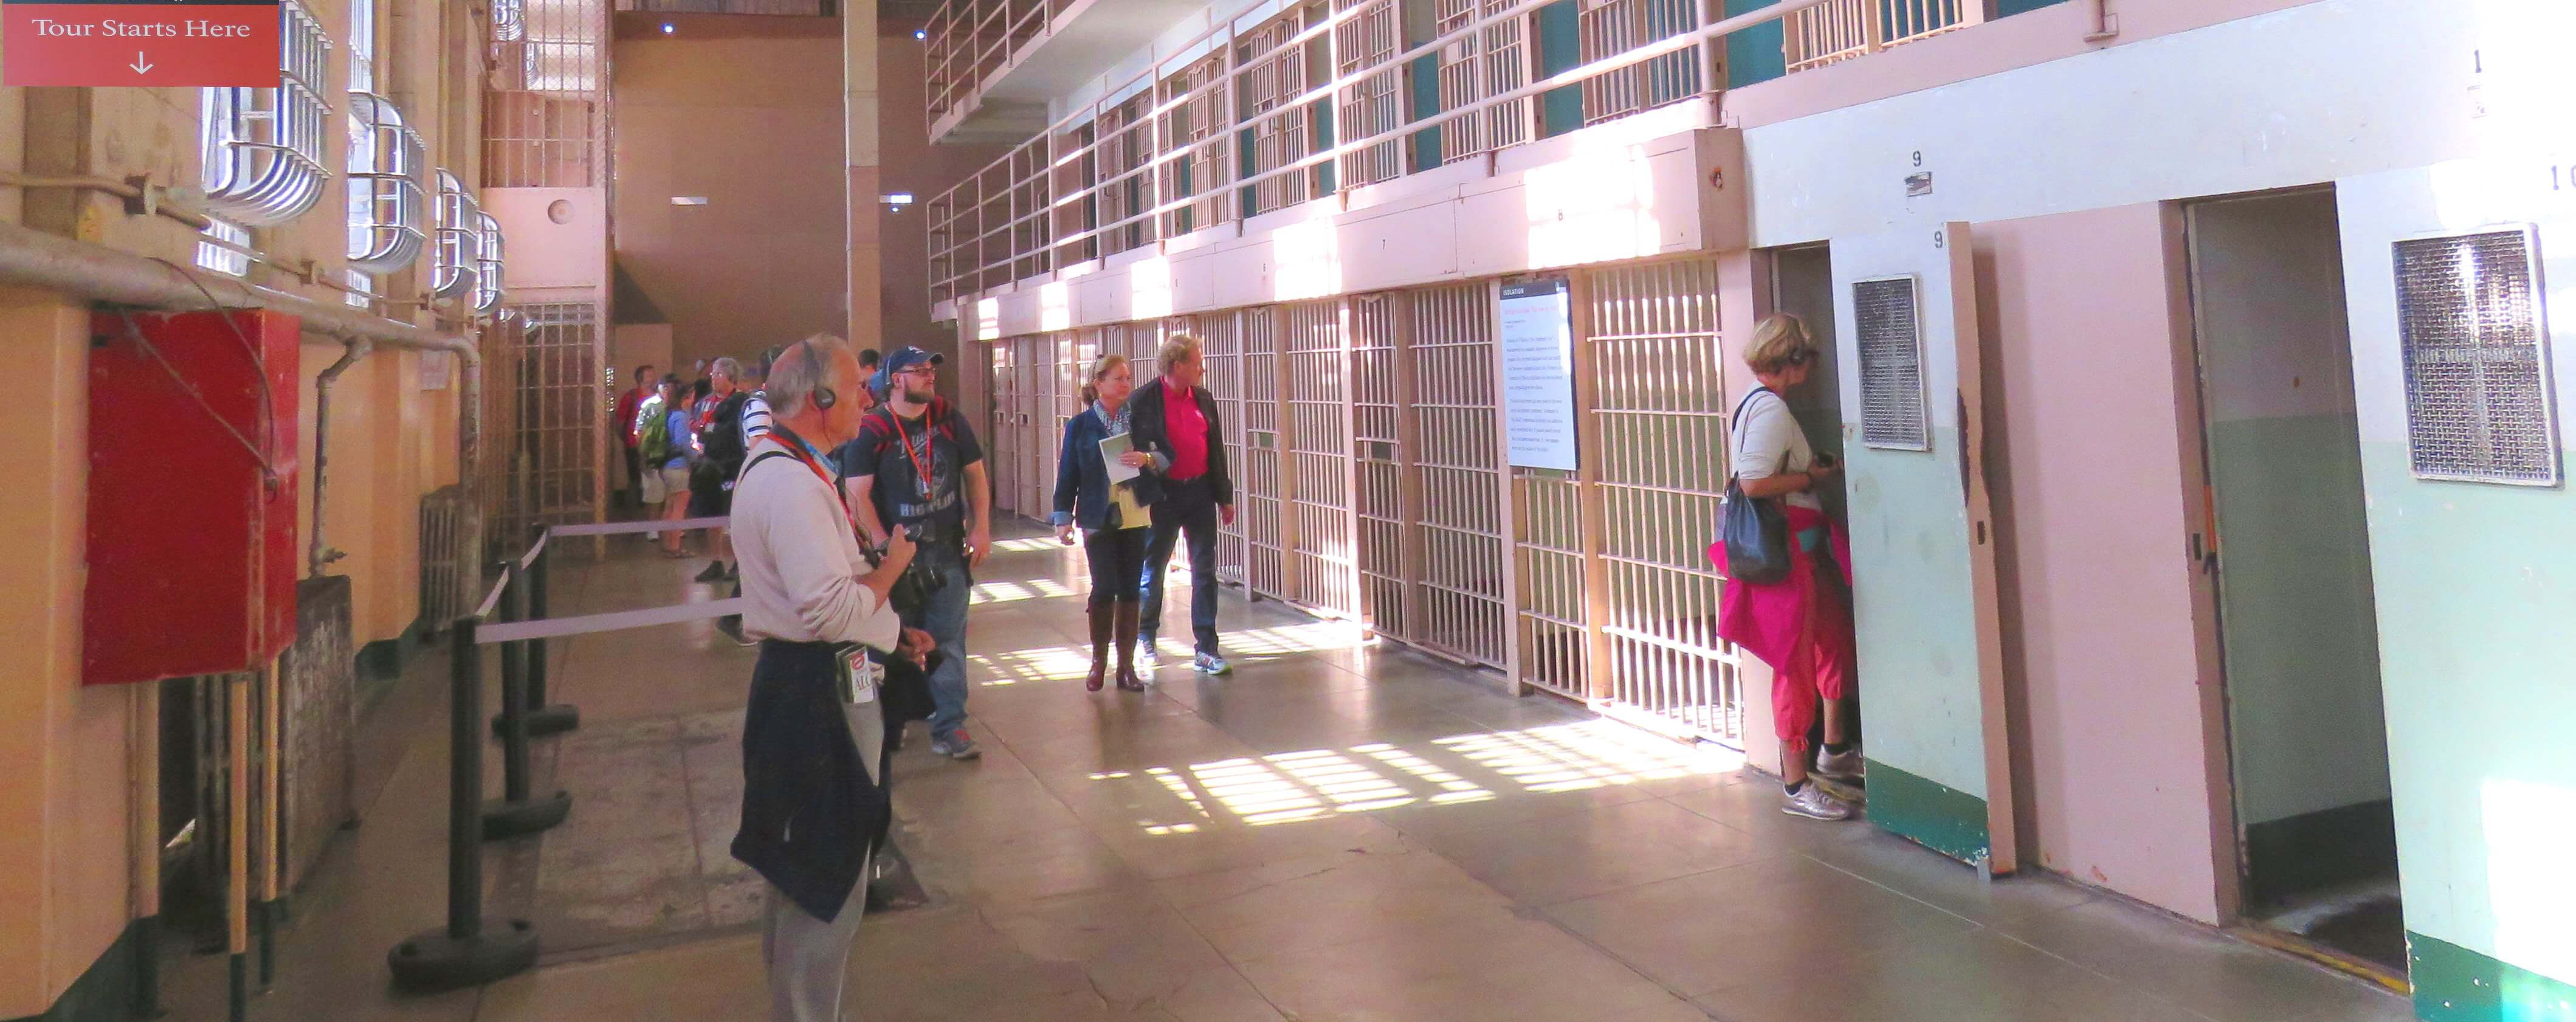 alcatraz-island-prison-cells-block-audio-tours-jail-frerry-tickets